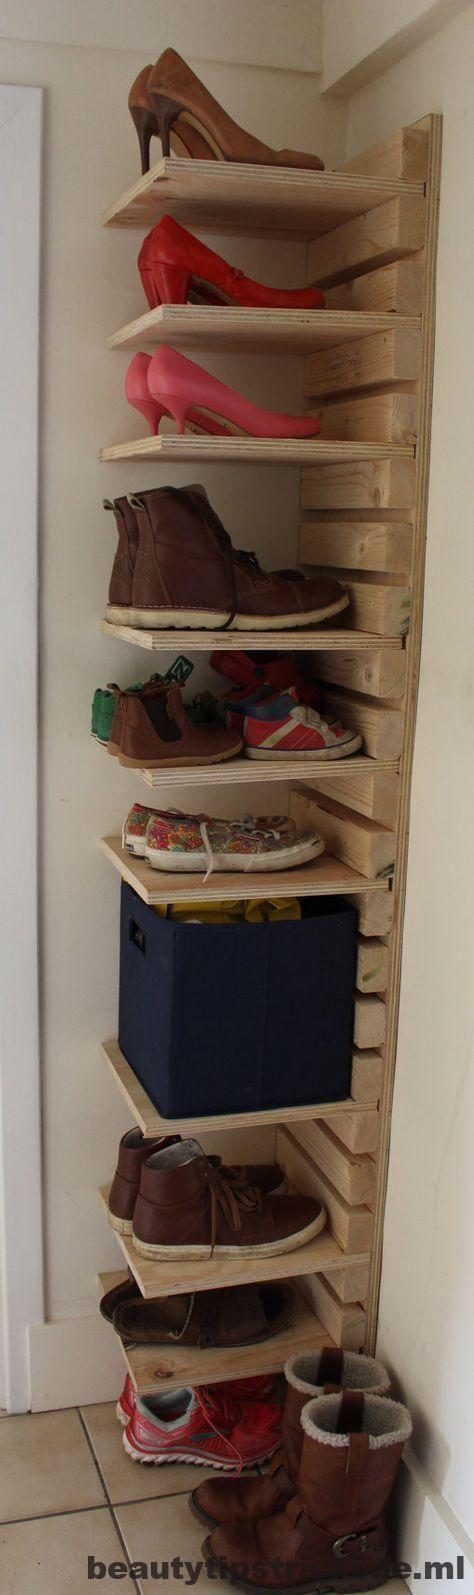 Garderobe #Wandrobe – Diy